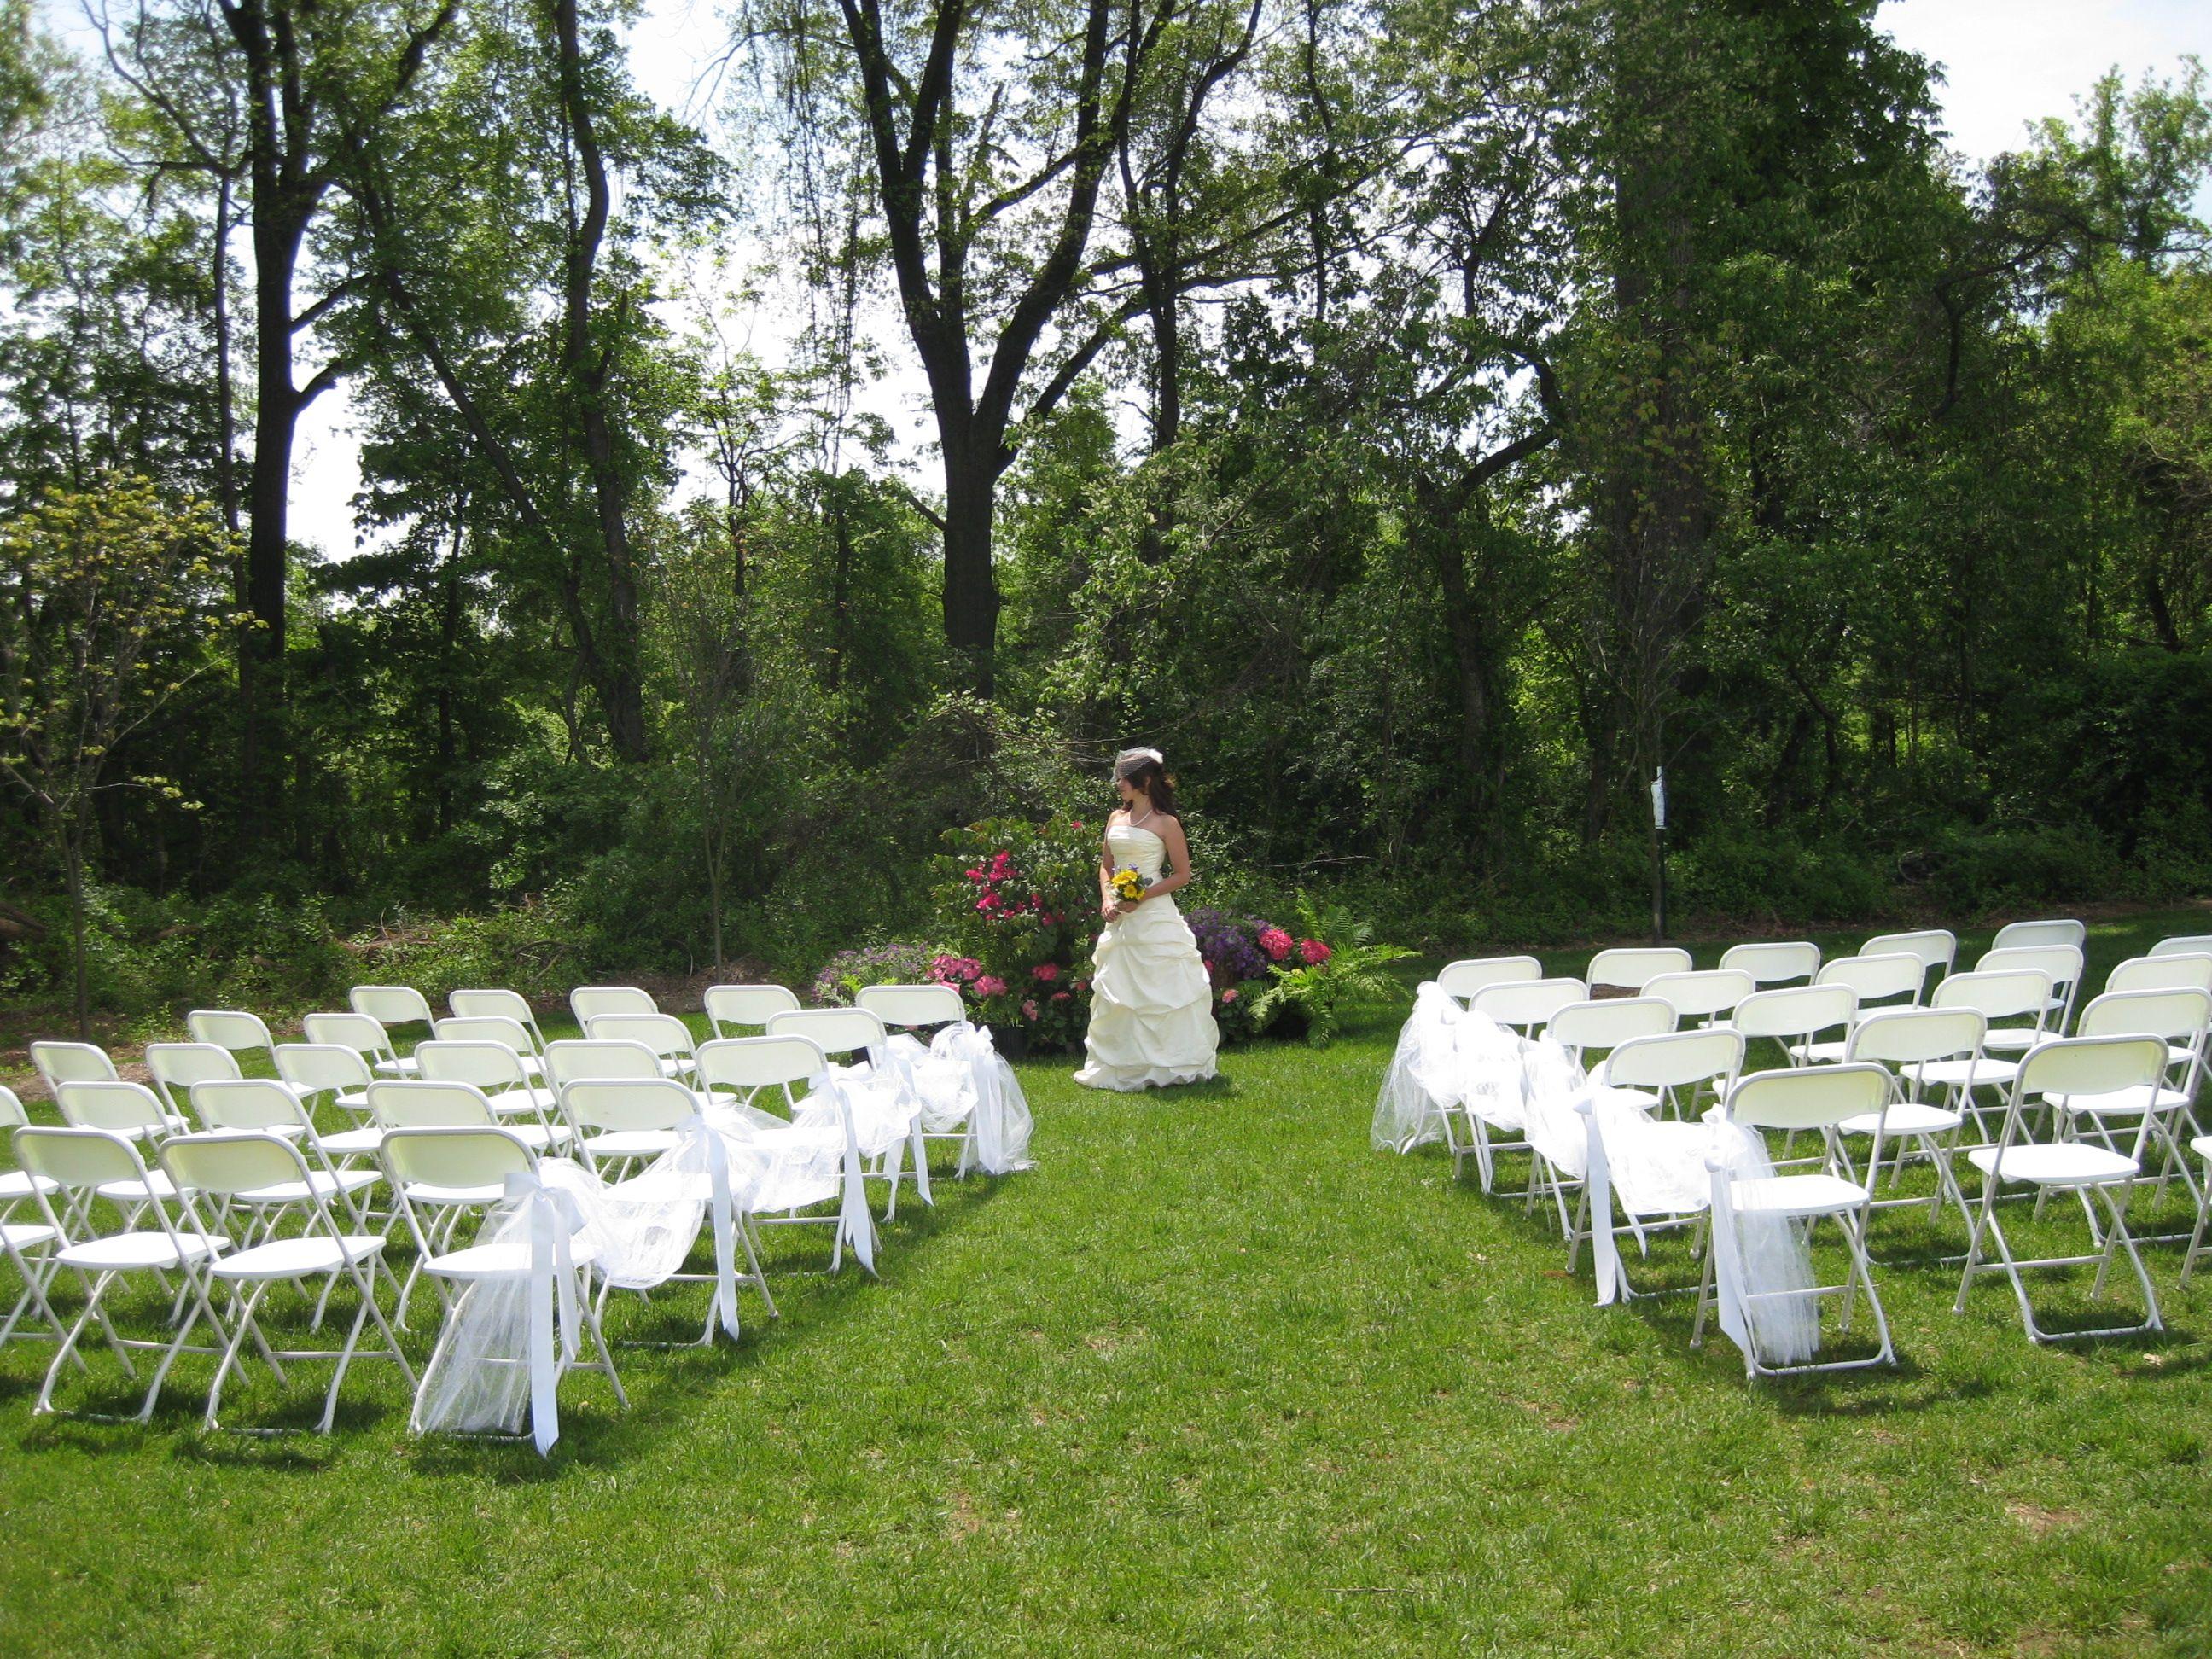 Outdoor amphitheatre   Green wedding, Nature center, Irvine